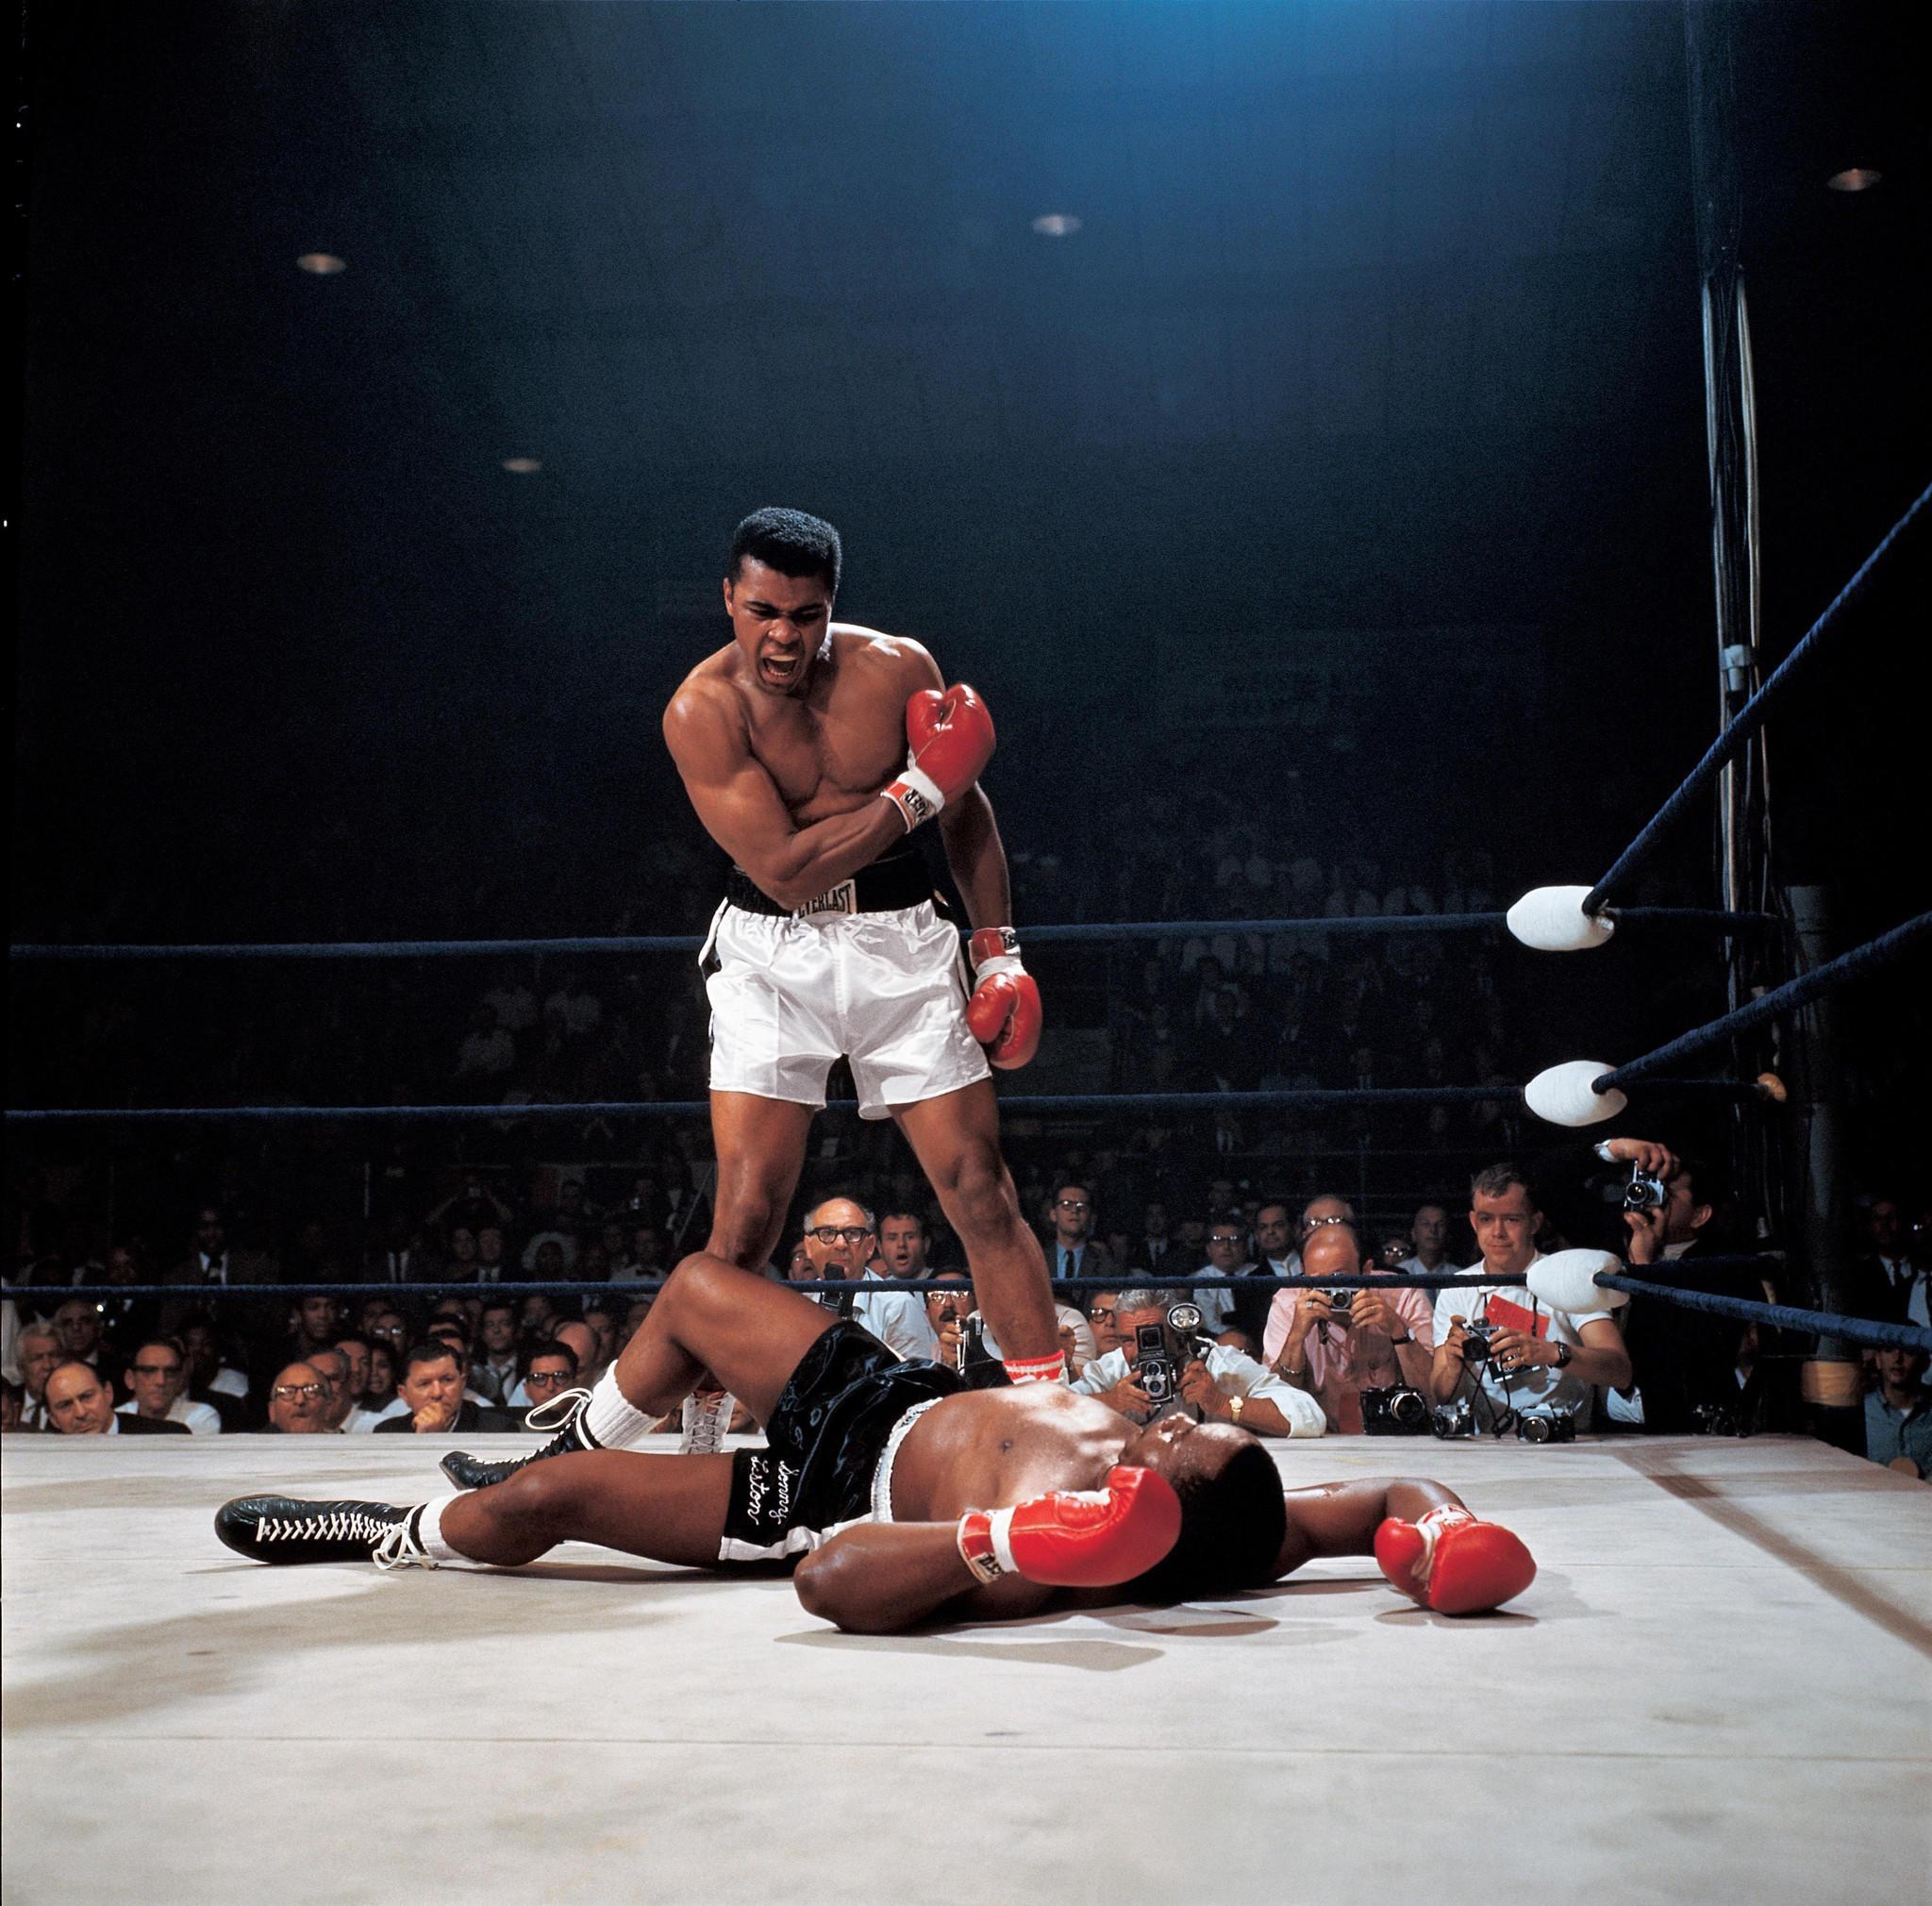 /var/www/html/wp-content/uploads/2018/09/la-muhammad-ali-vs-sonny-liston-1965-world-heavyweight-title-20160603